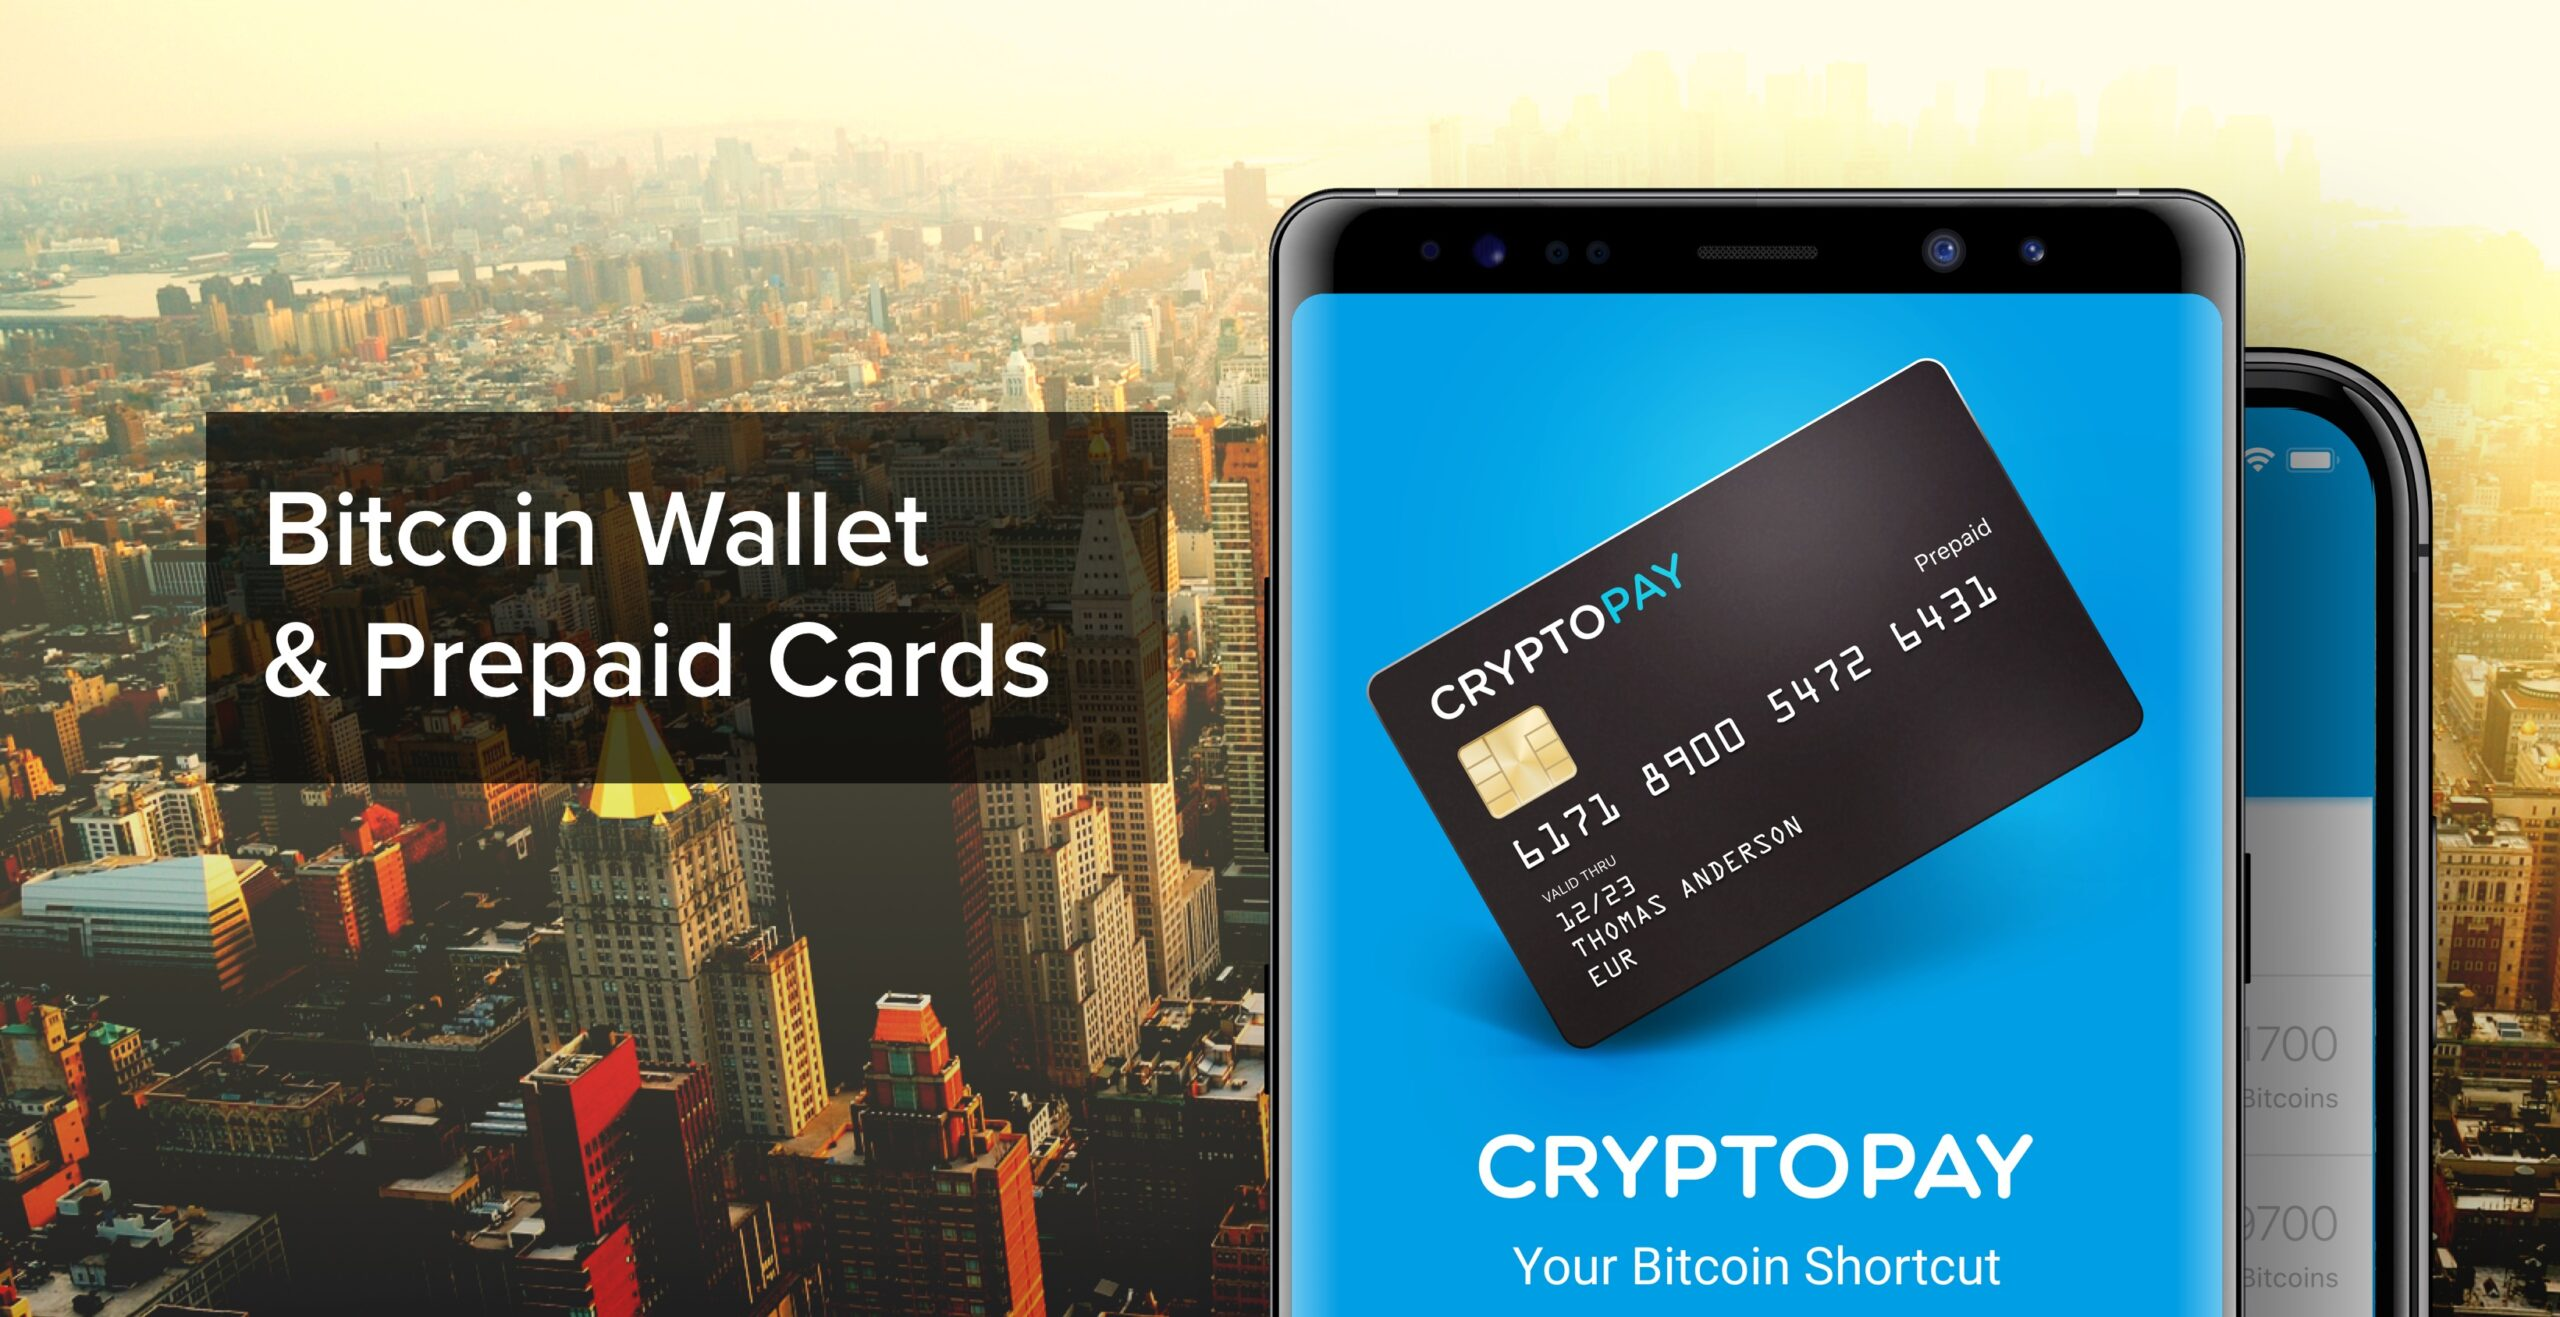 Cryptopay Visa Card